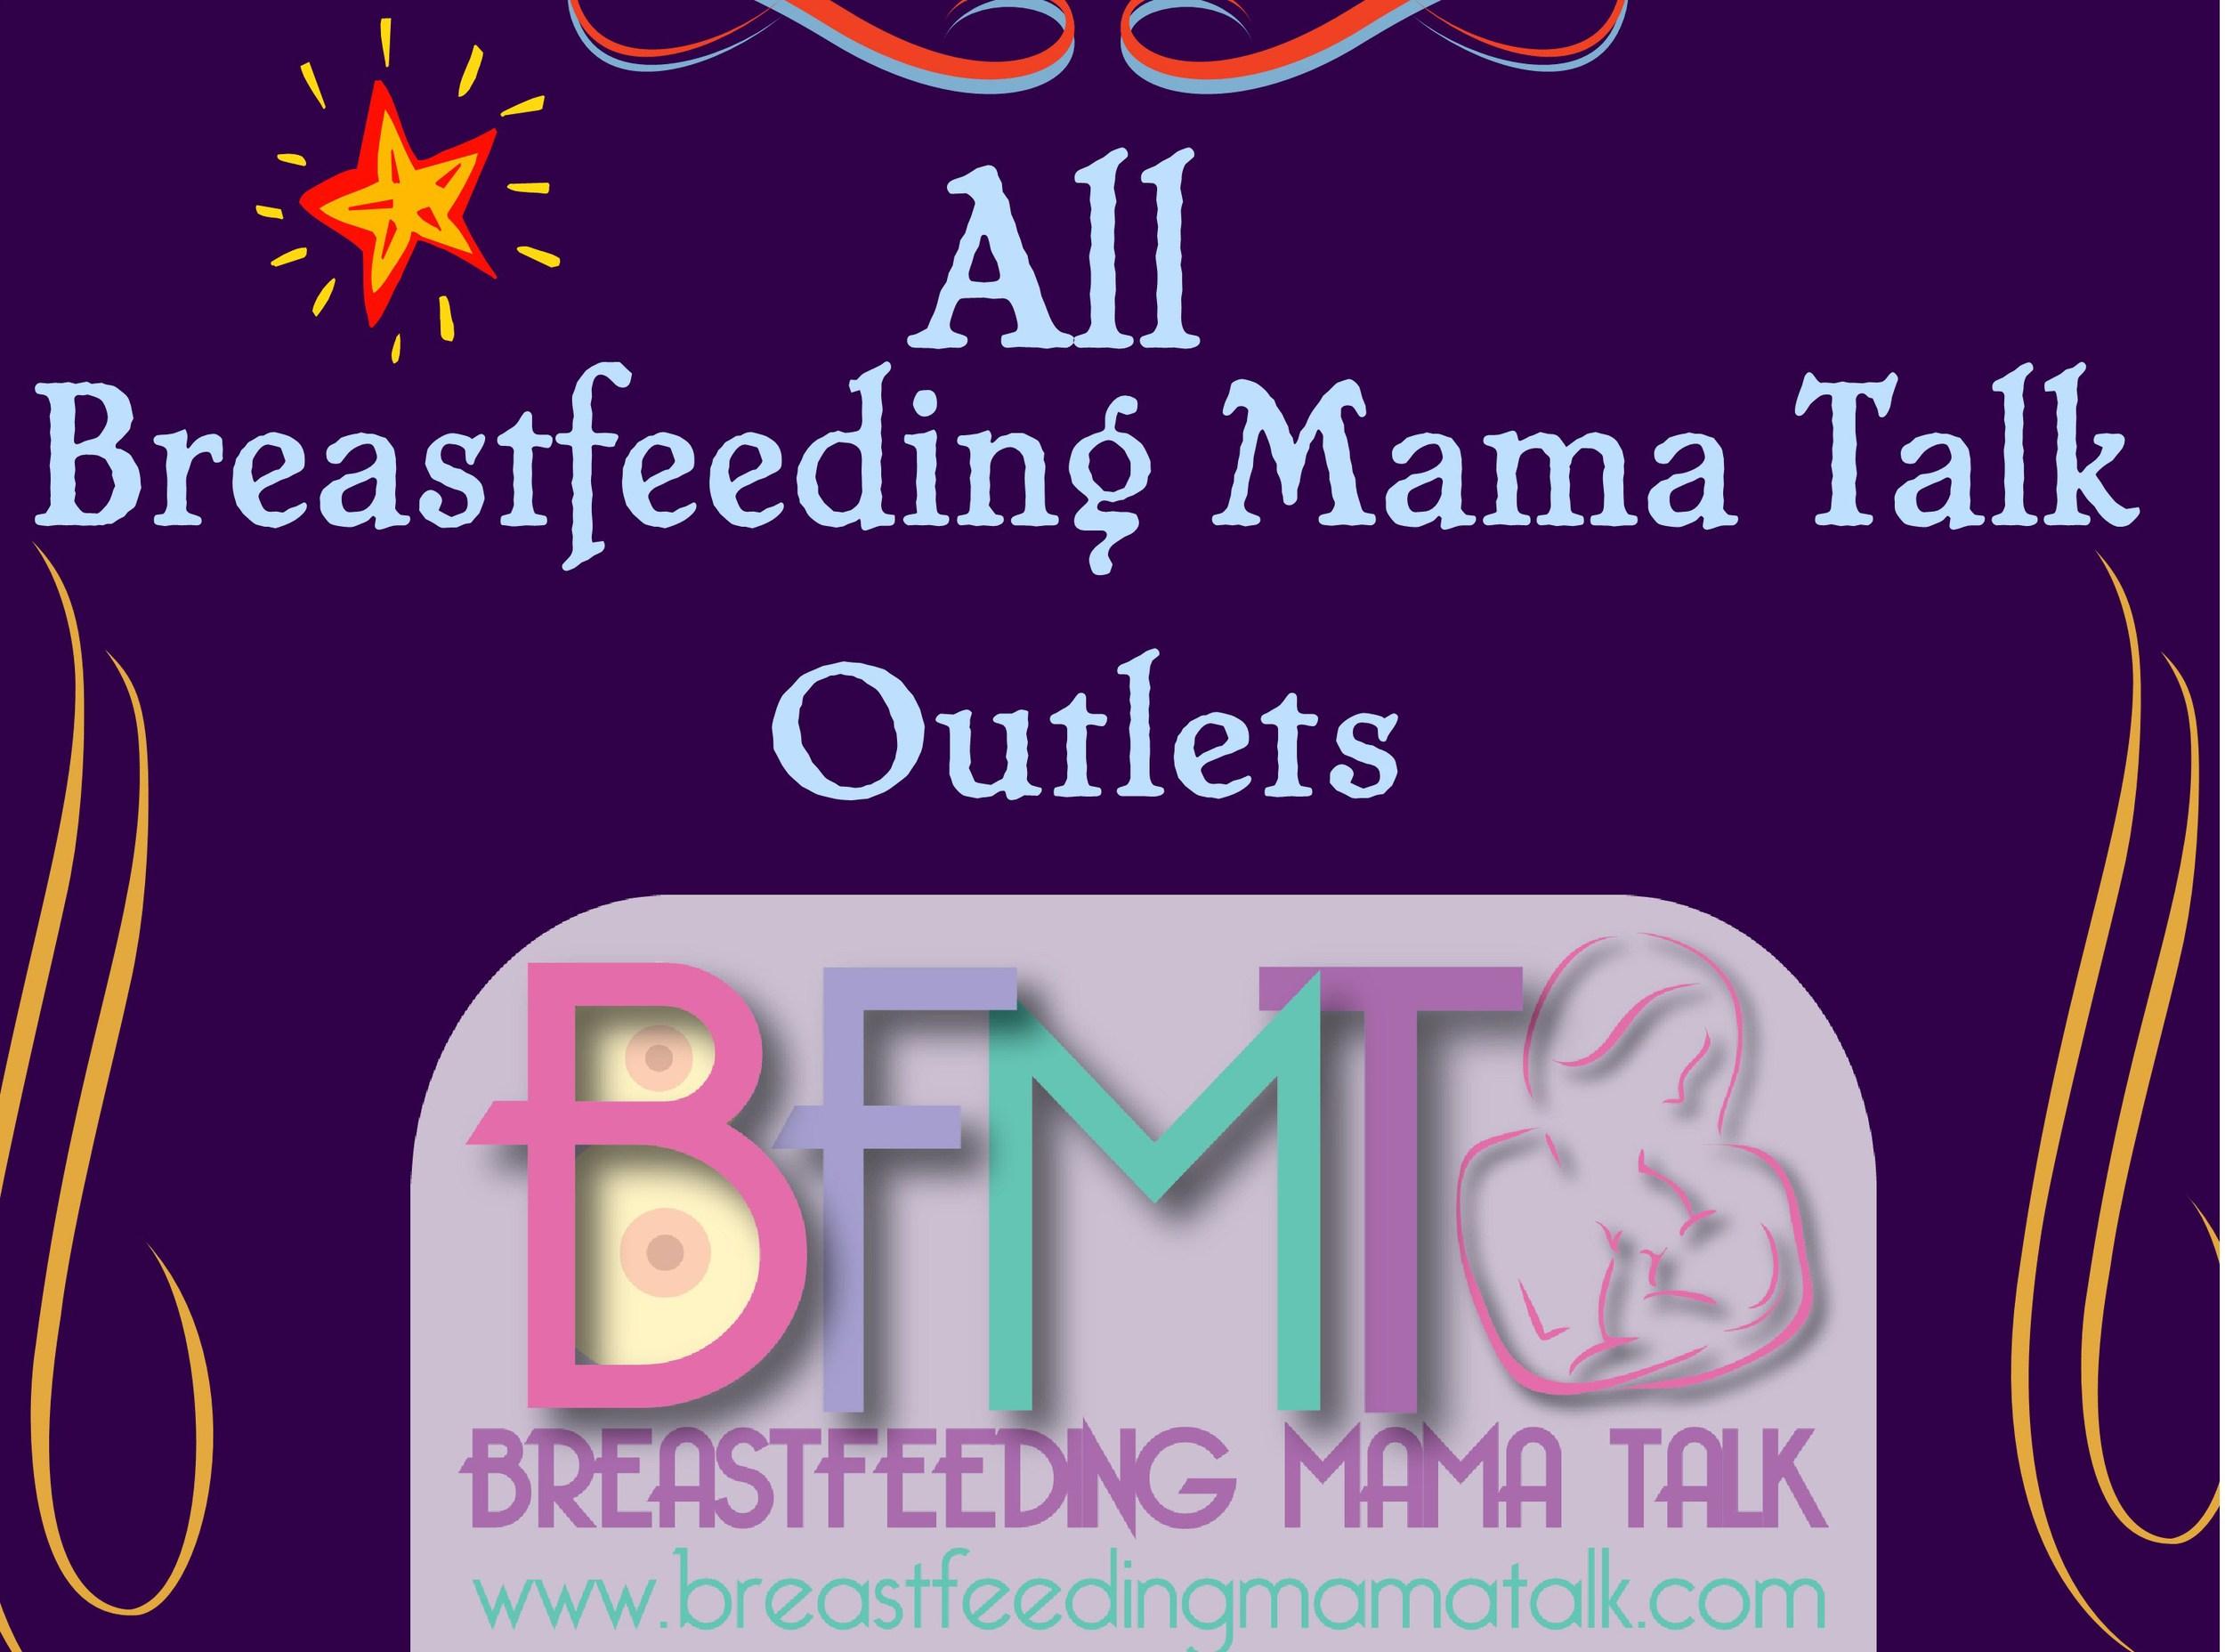 All BFMT Outlets